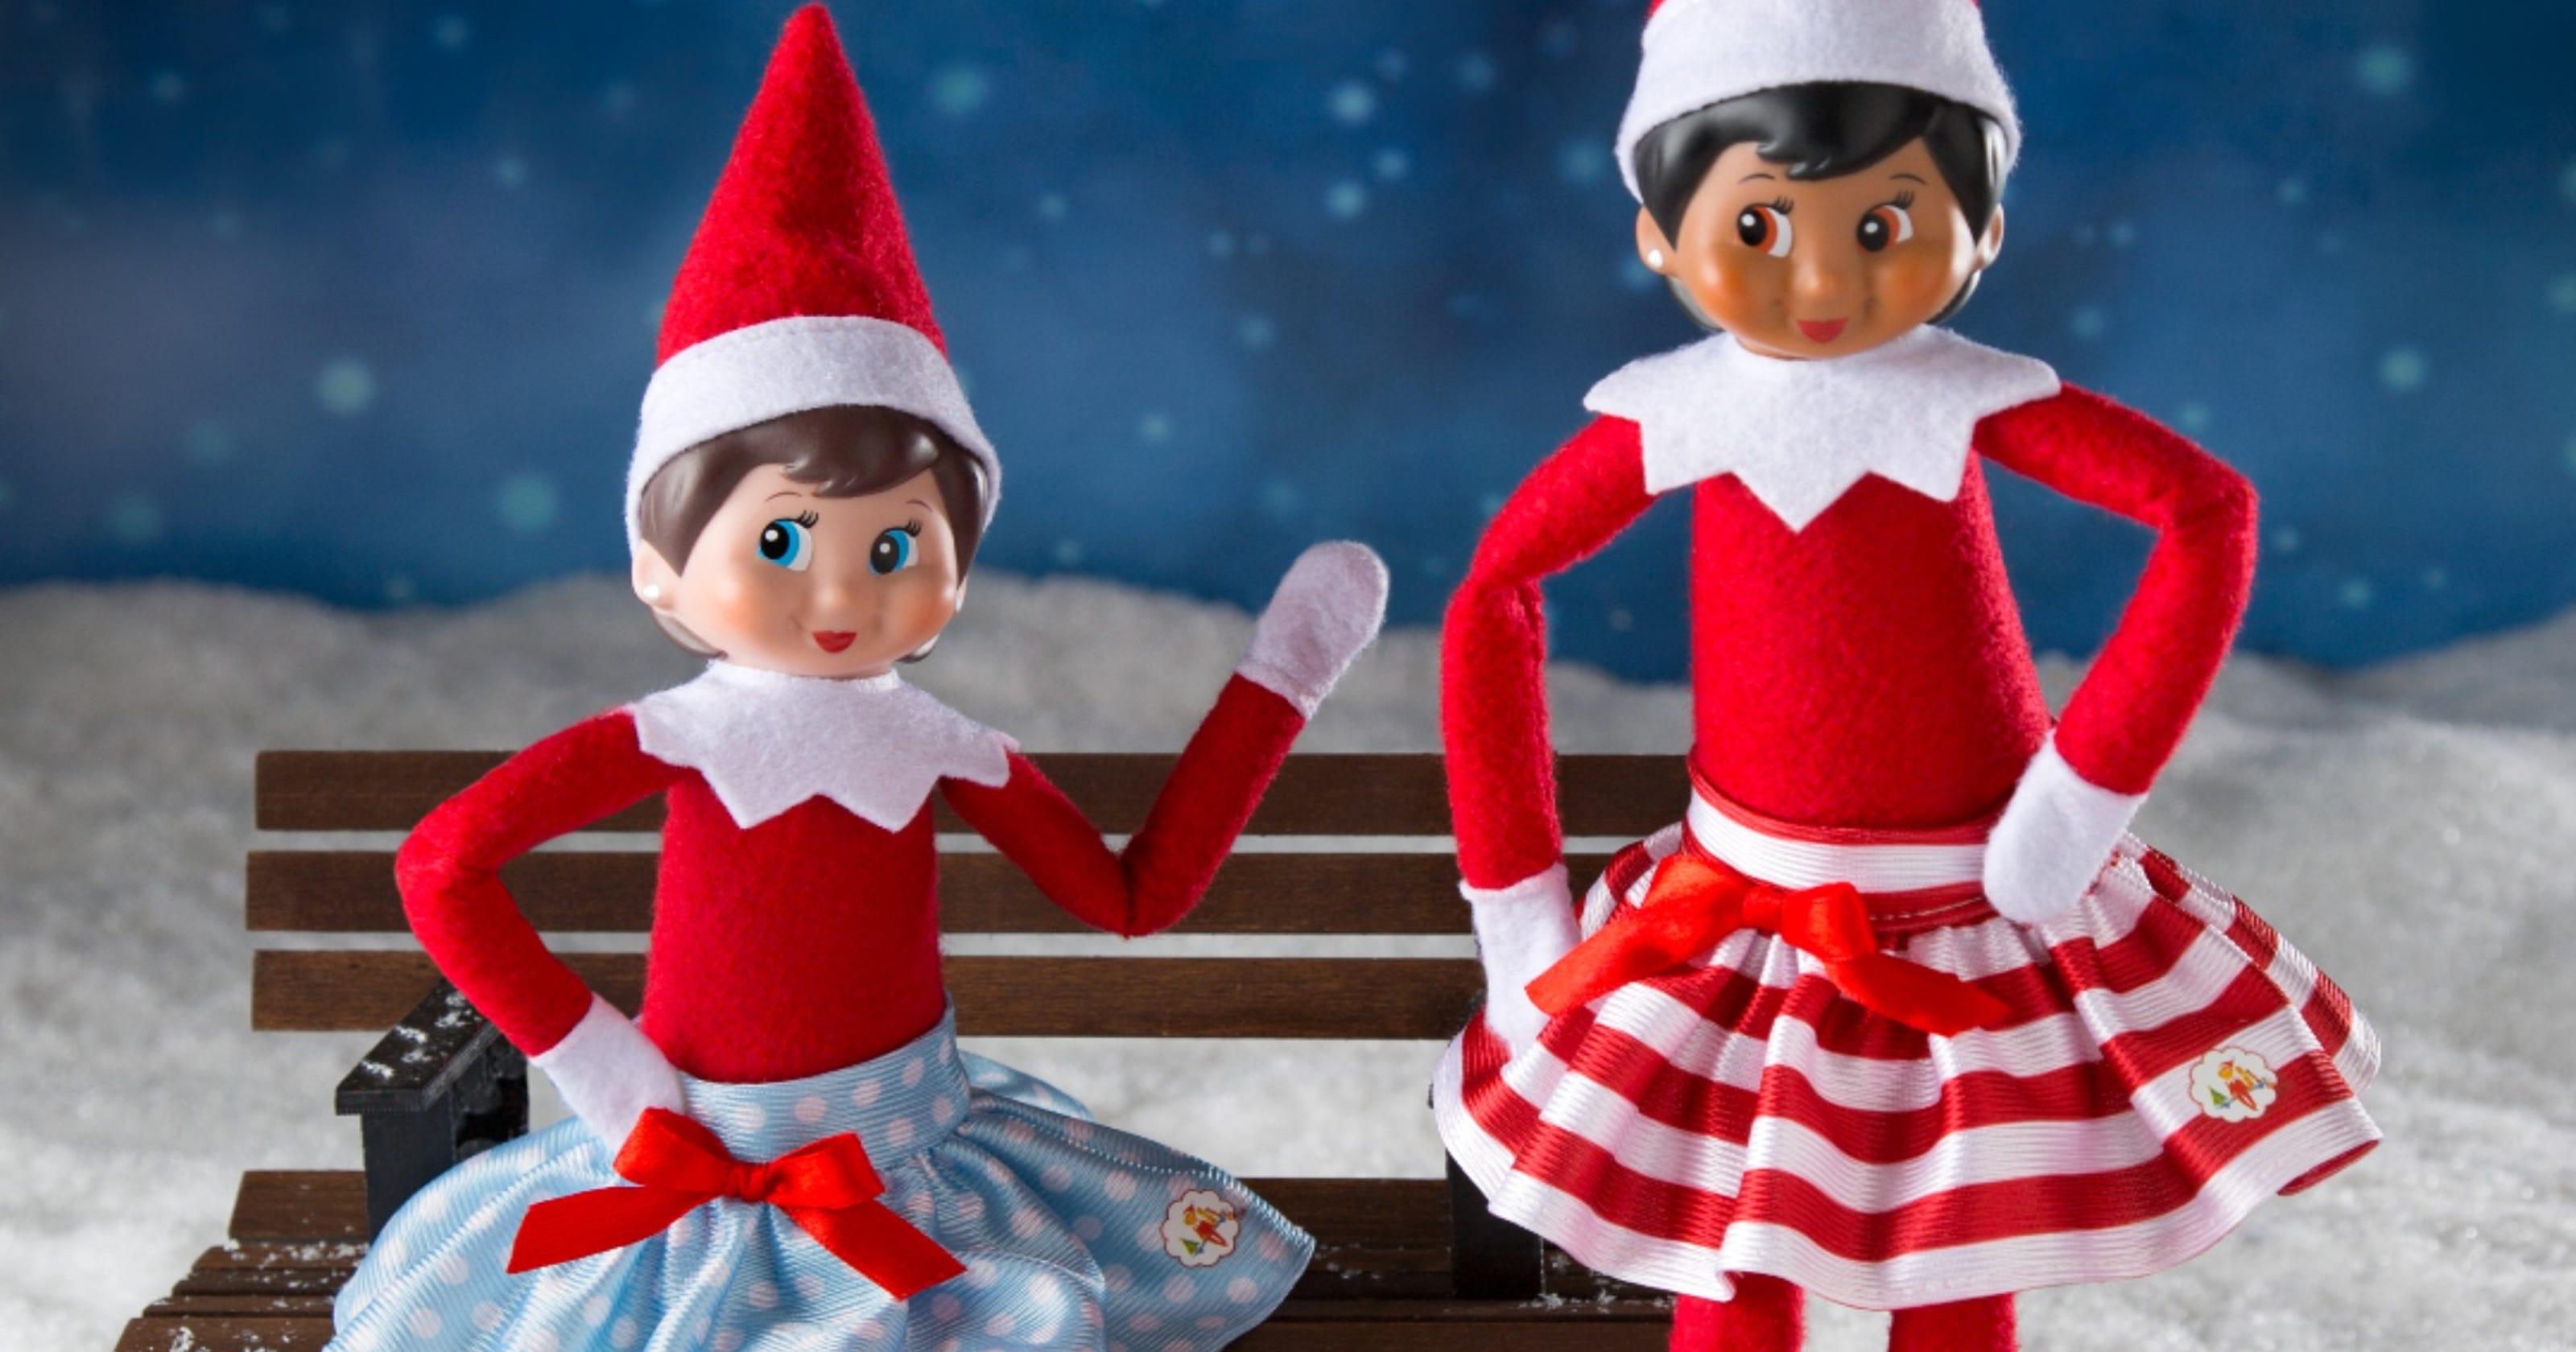 bd18579915476 25 Elf on the Shelf ideas for hiding spots